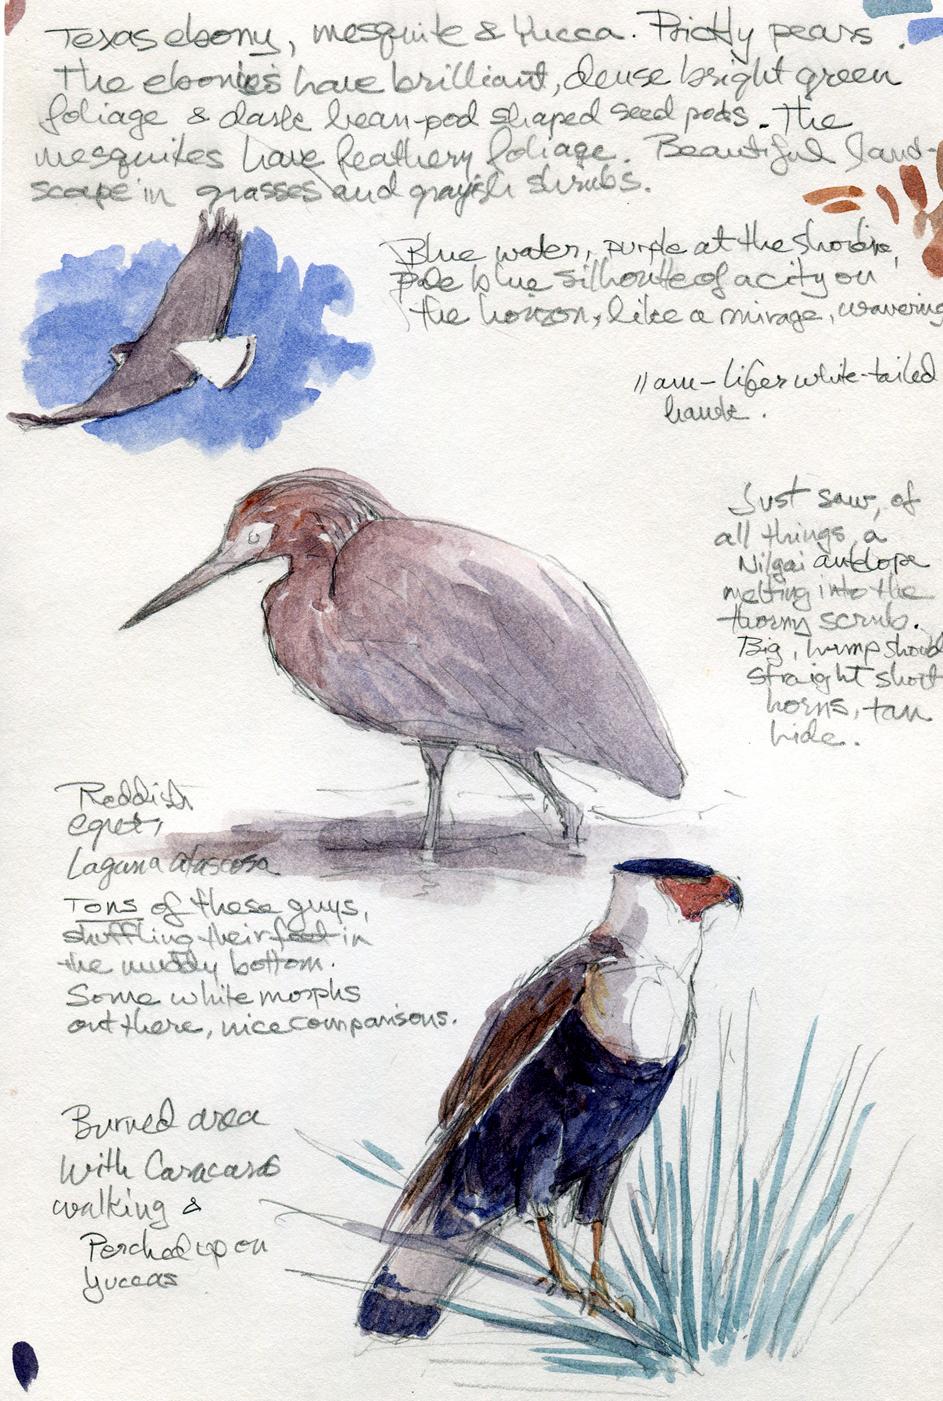 Binoculars Bugspray Sketchbook Drawing The Motmot